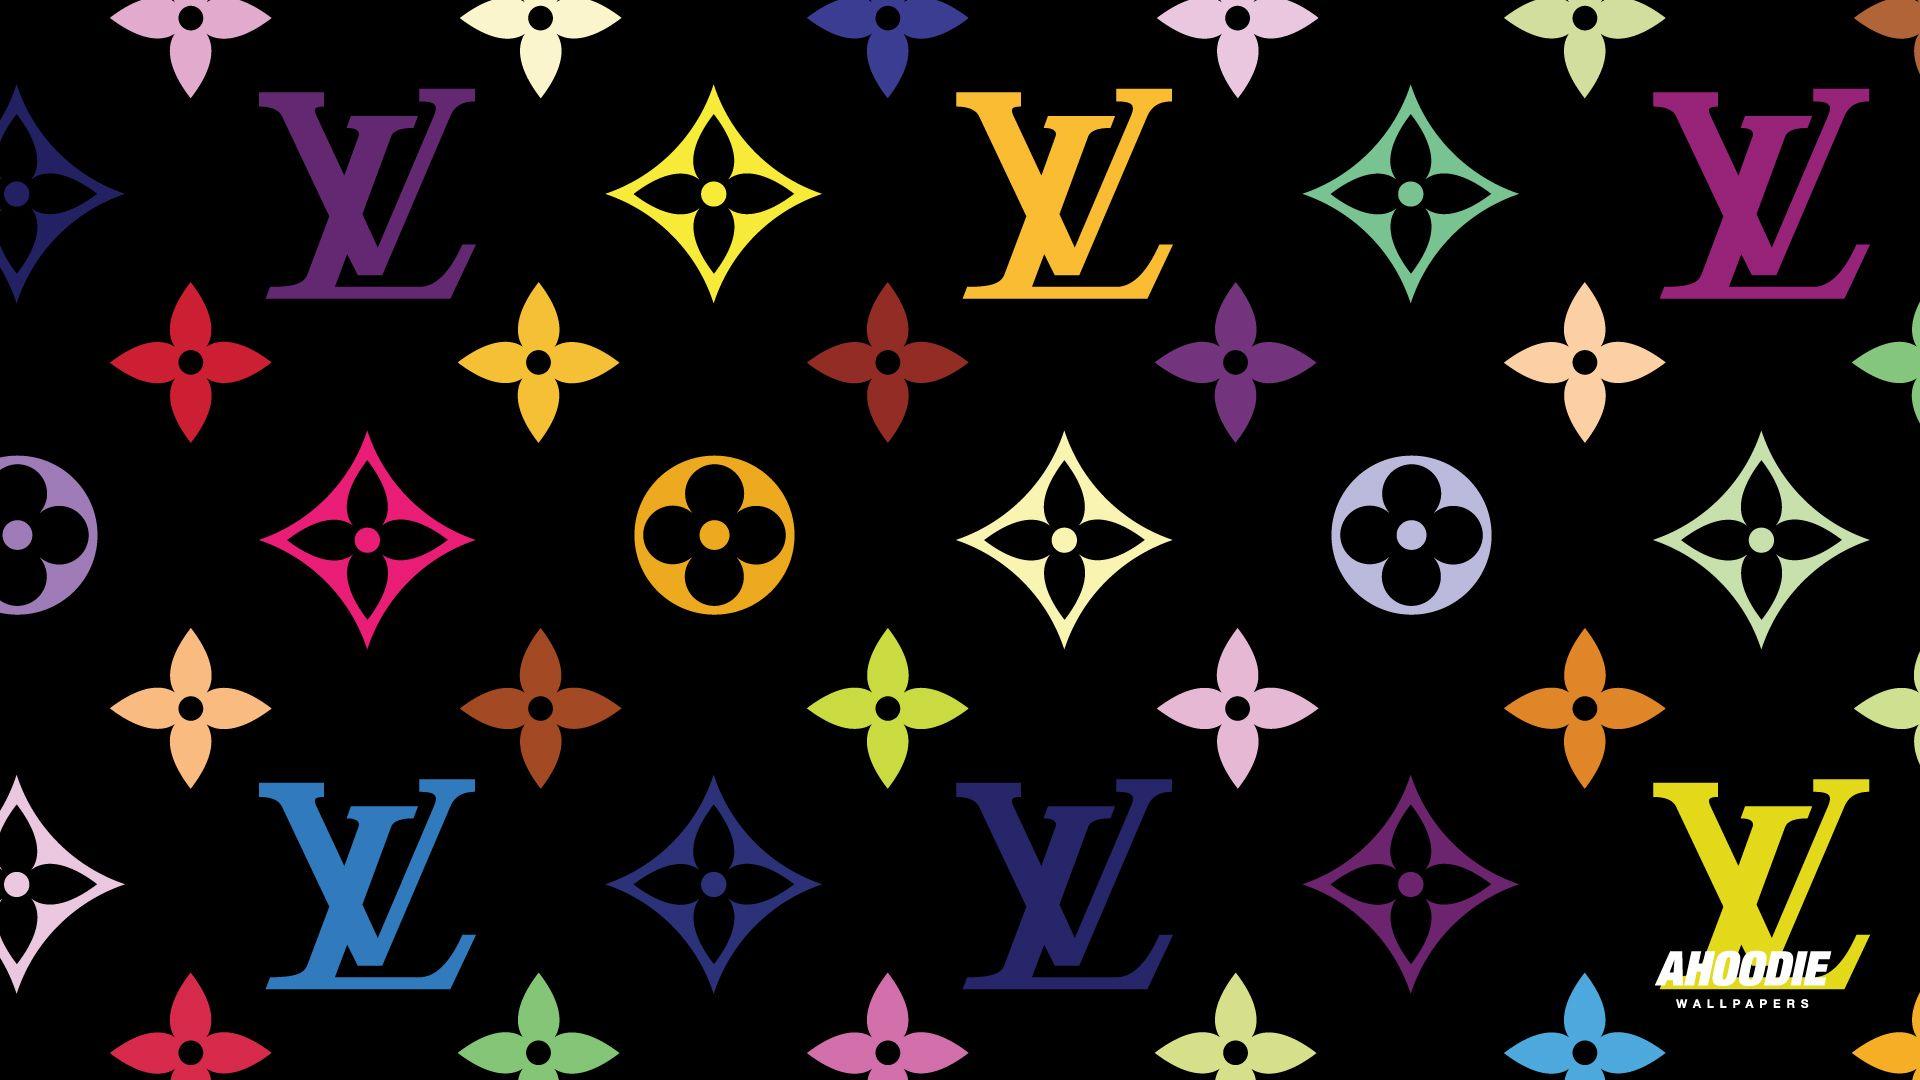 Louis Vuitton Desktop Wallpapers AHOODIE   Brand wallpapers 1920x1080